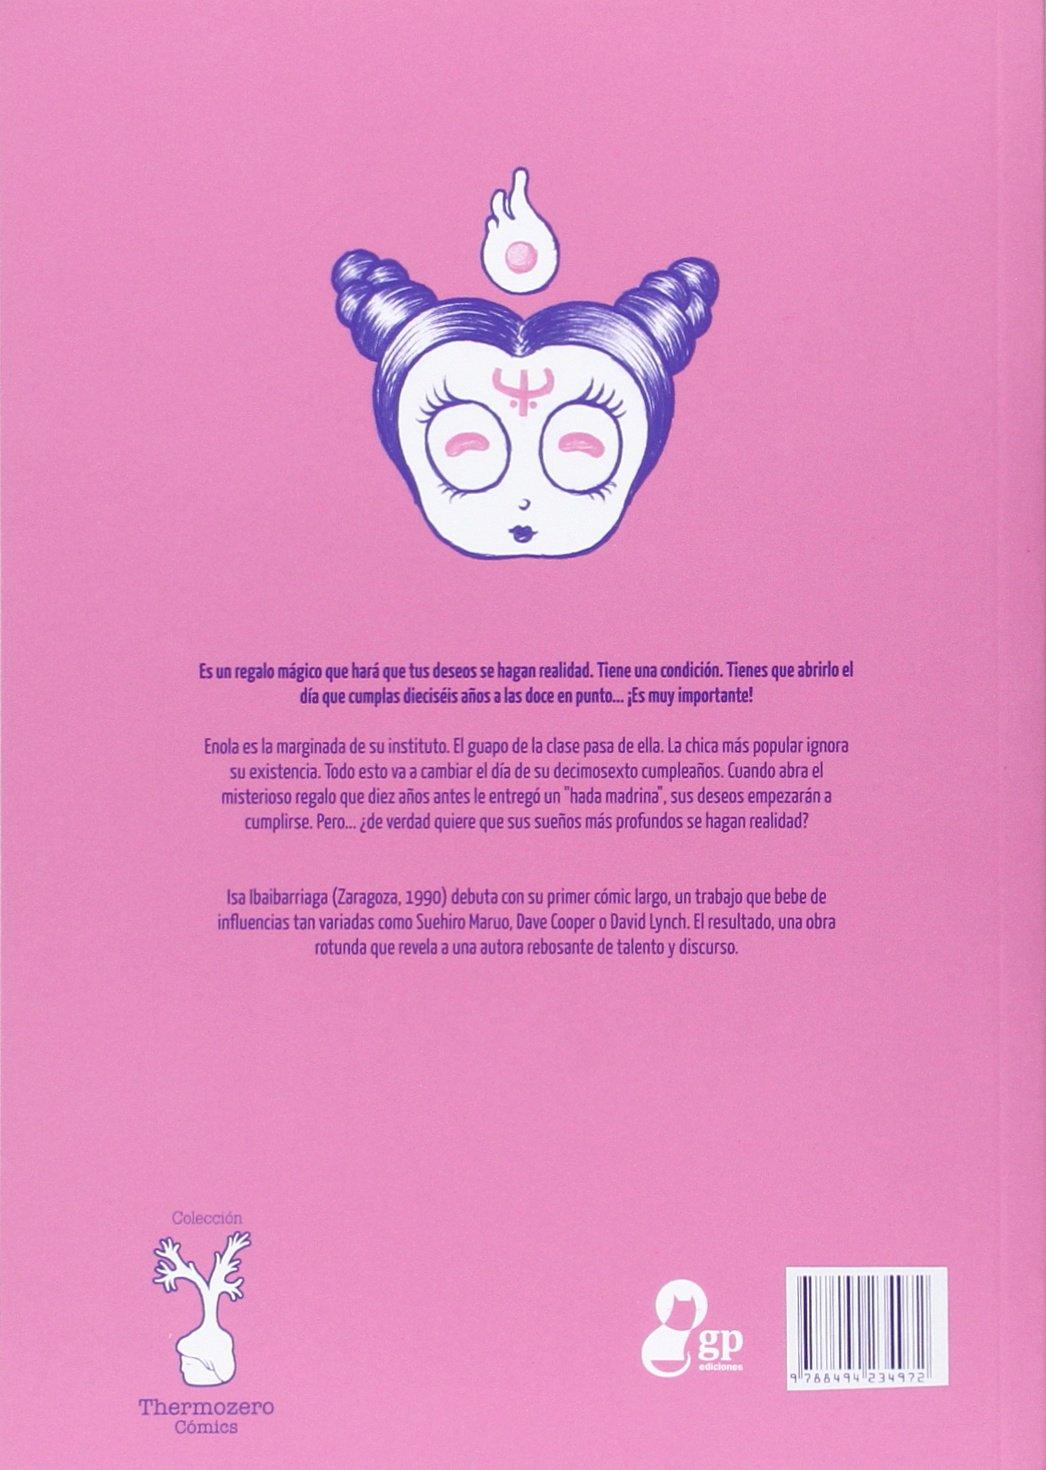 Amazon.com: Gummy Girl (9788494234972): ISA IBAIBARRIAGA: Books